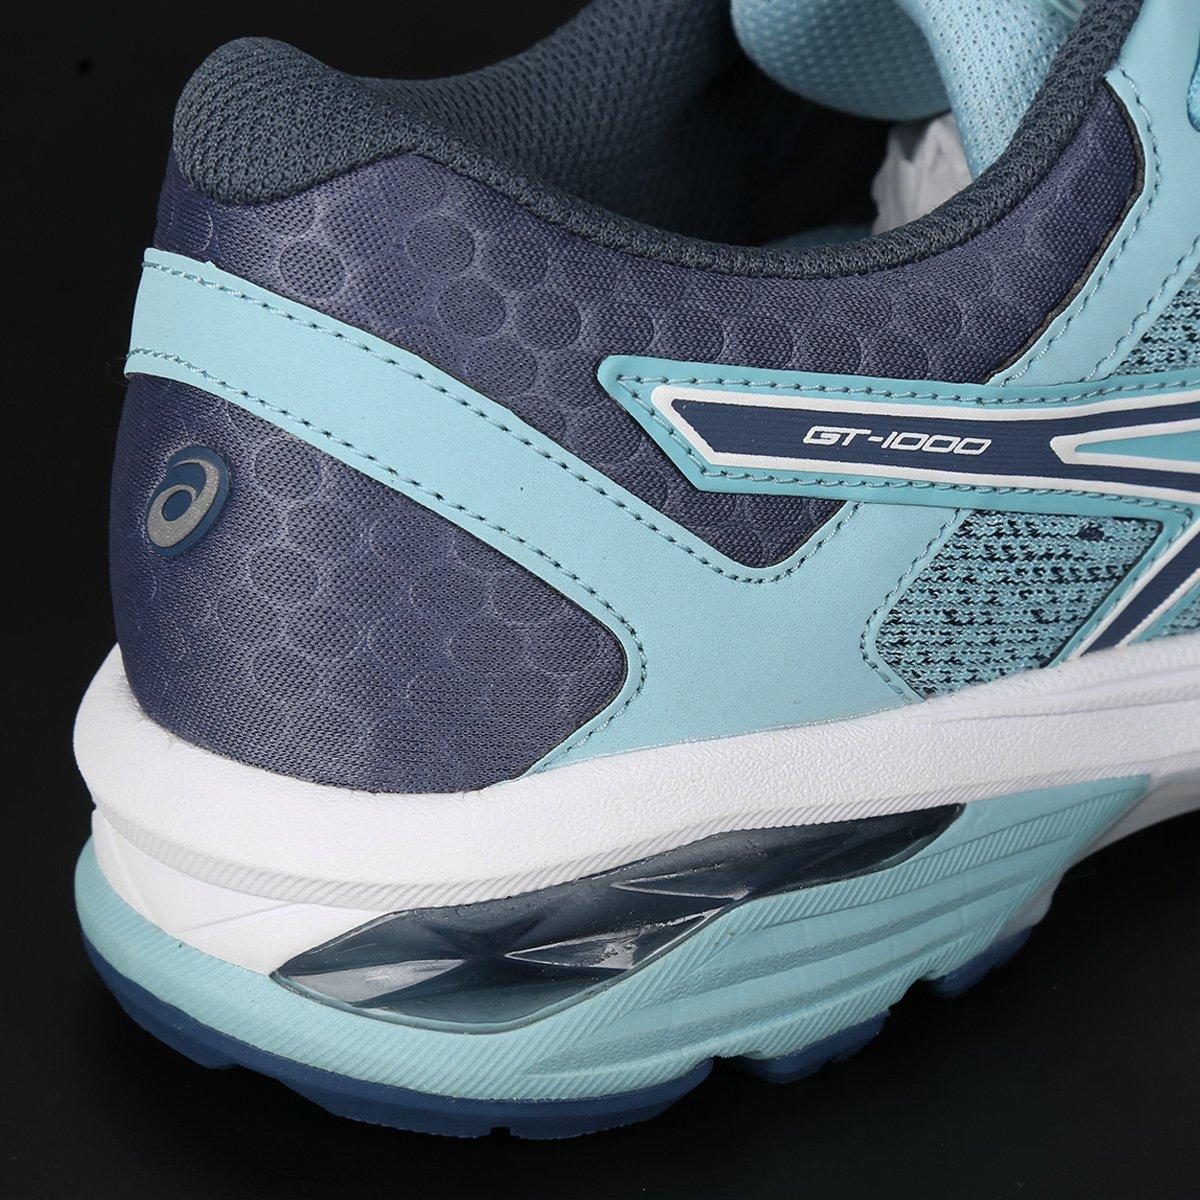 1000 Tênis Asics Feminino Feminino Gt 1000 e 6 Tênis Gt Azul Asics 6 Preto Azul e qng78vnX